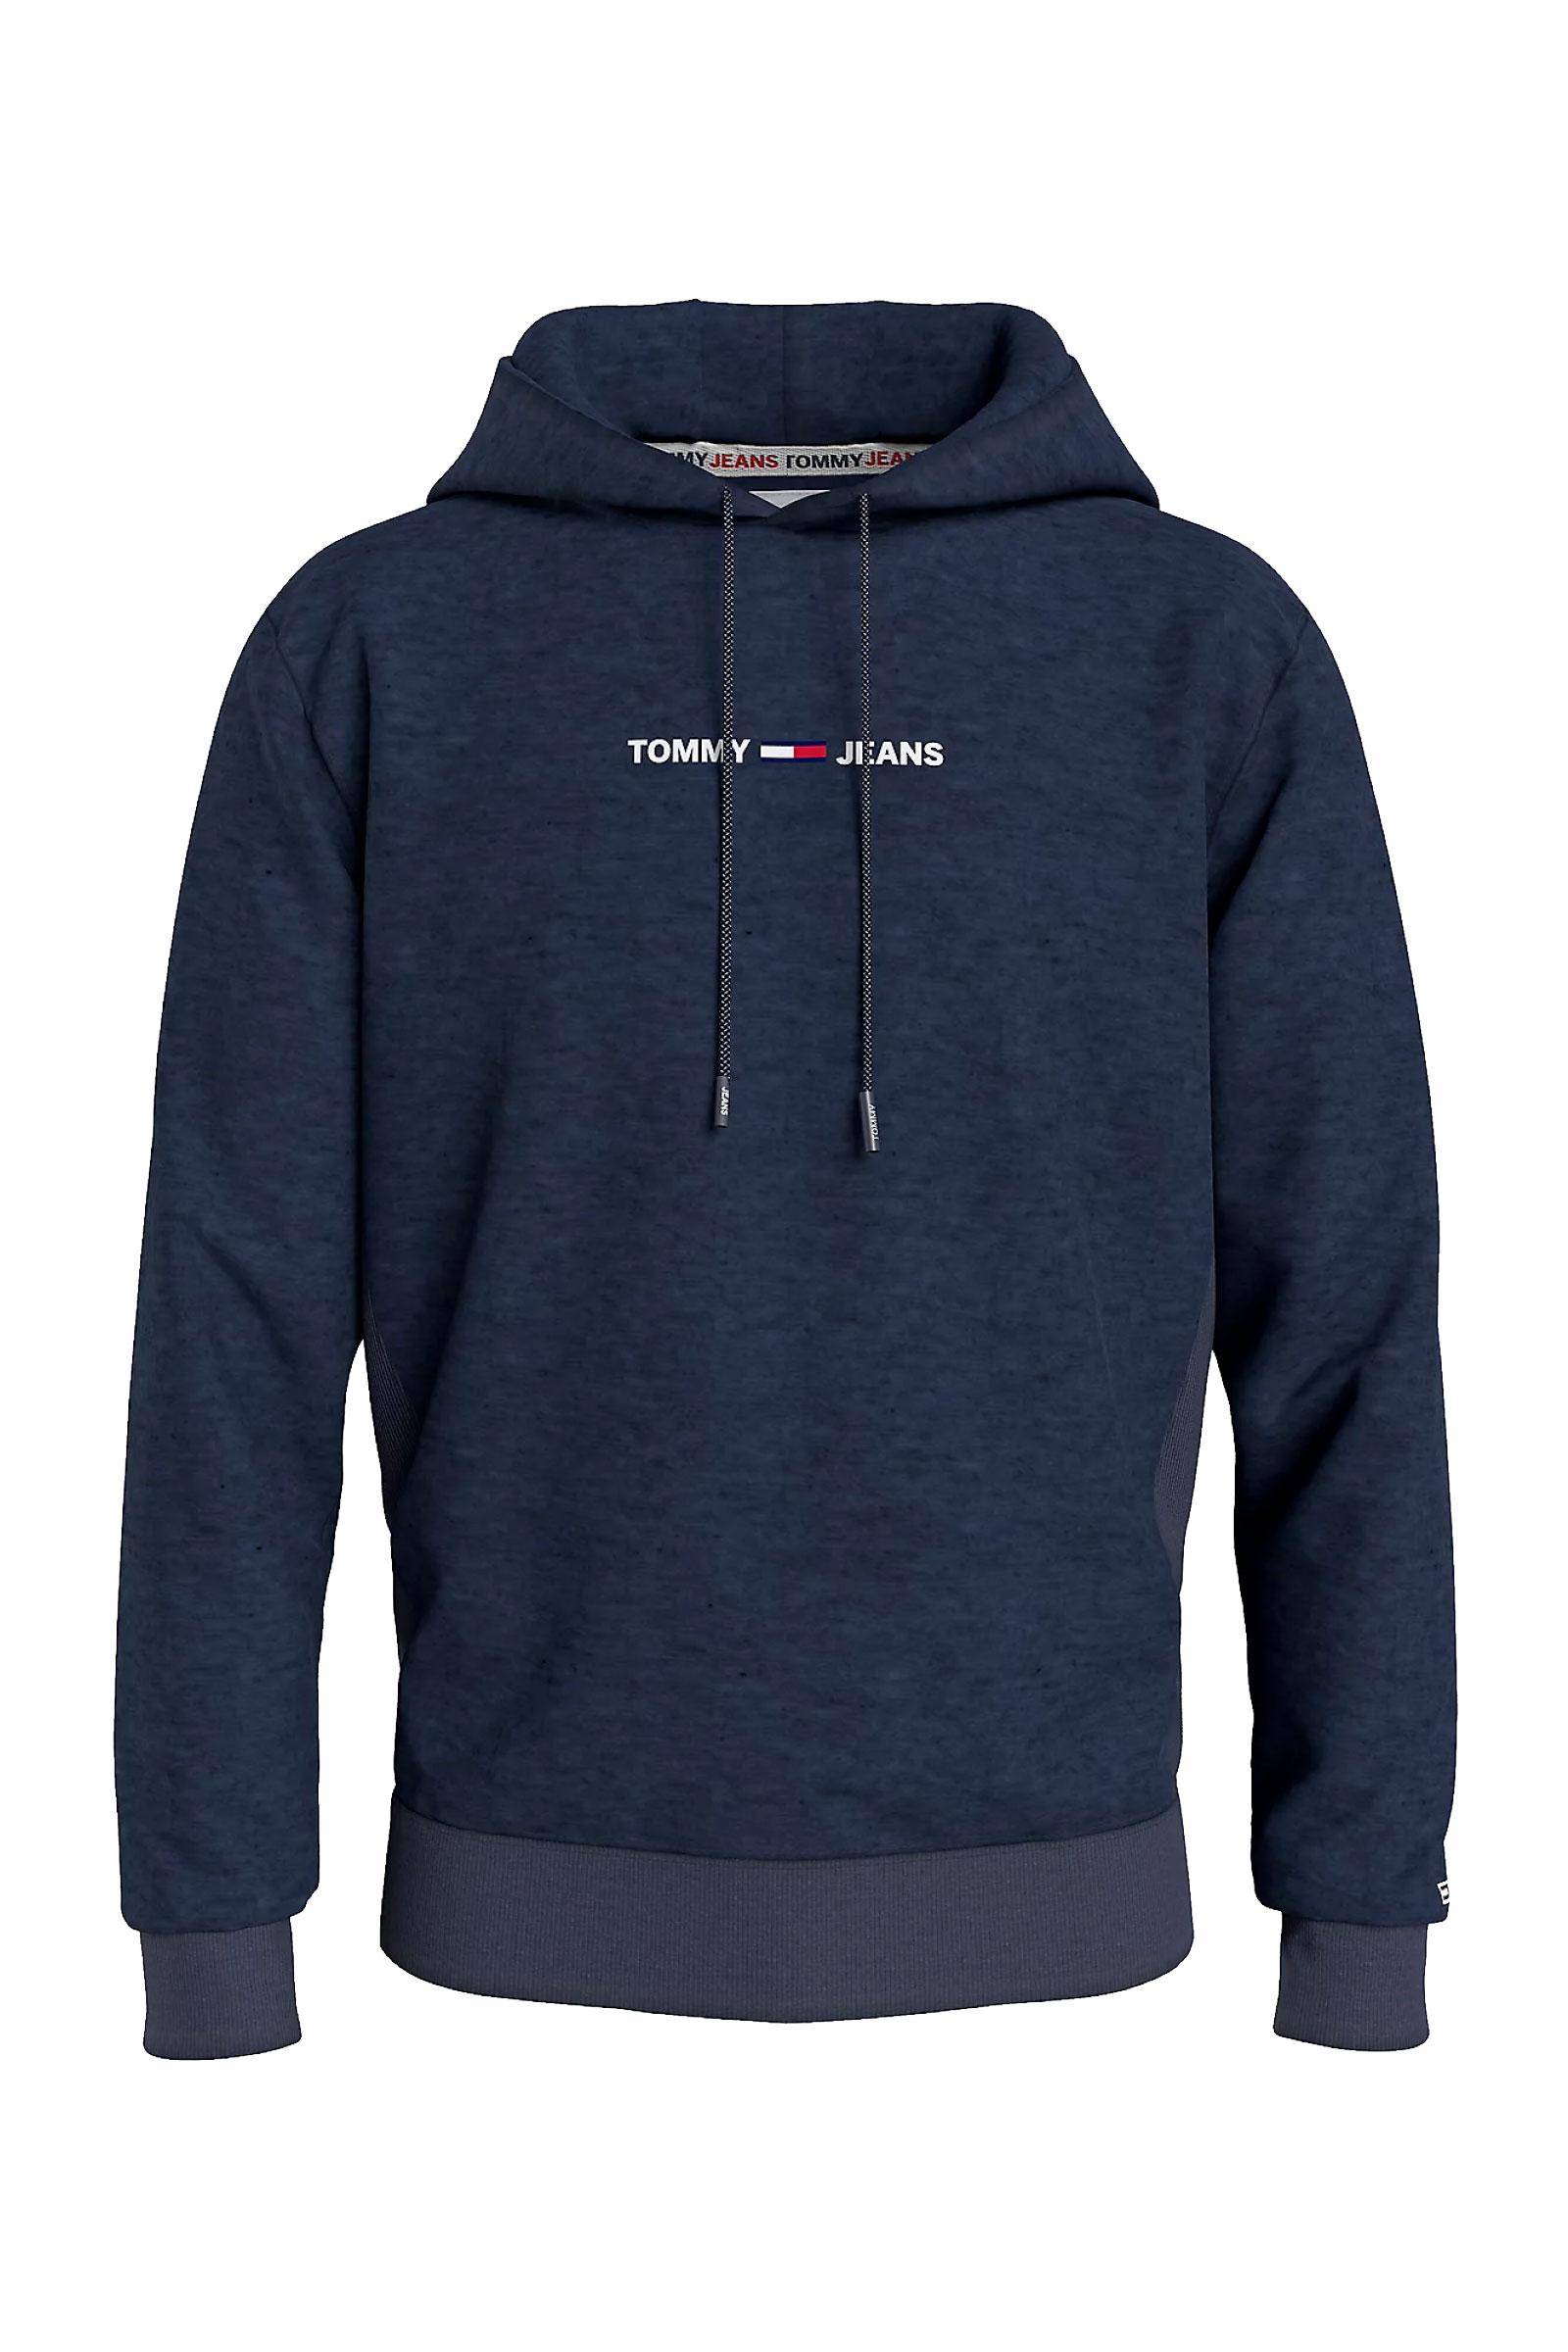 TOMMY JEANS   Sweatshirt   DM0DM11632C87